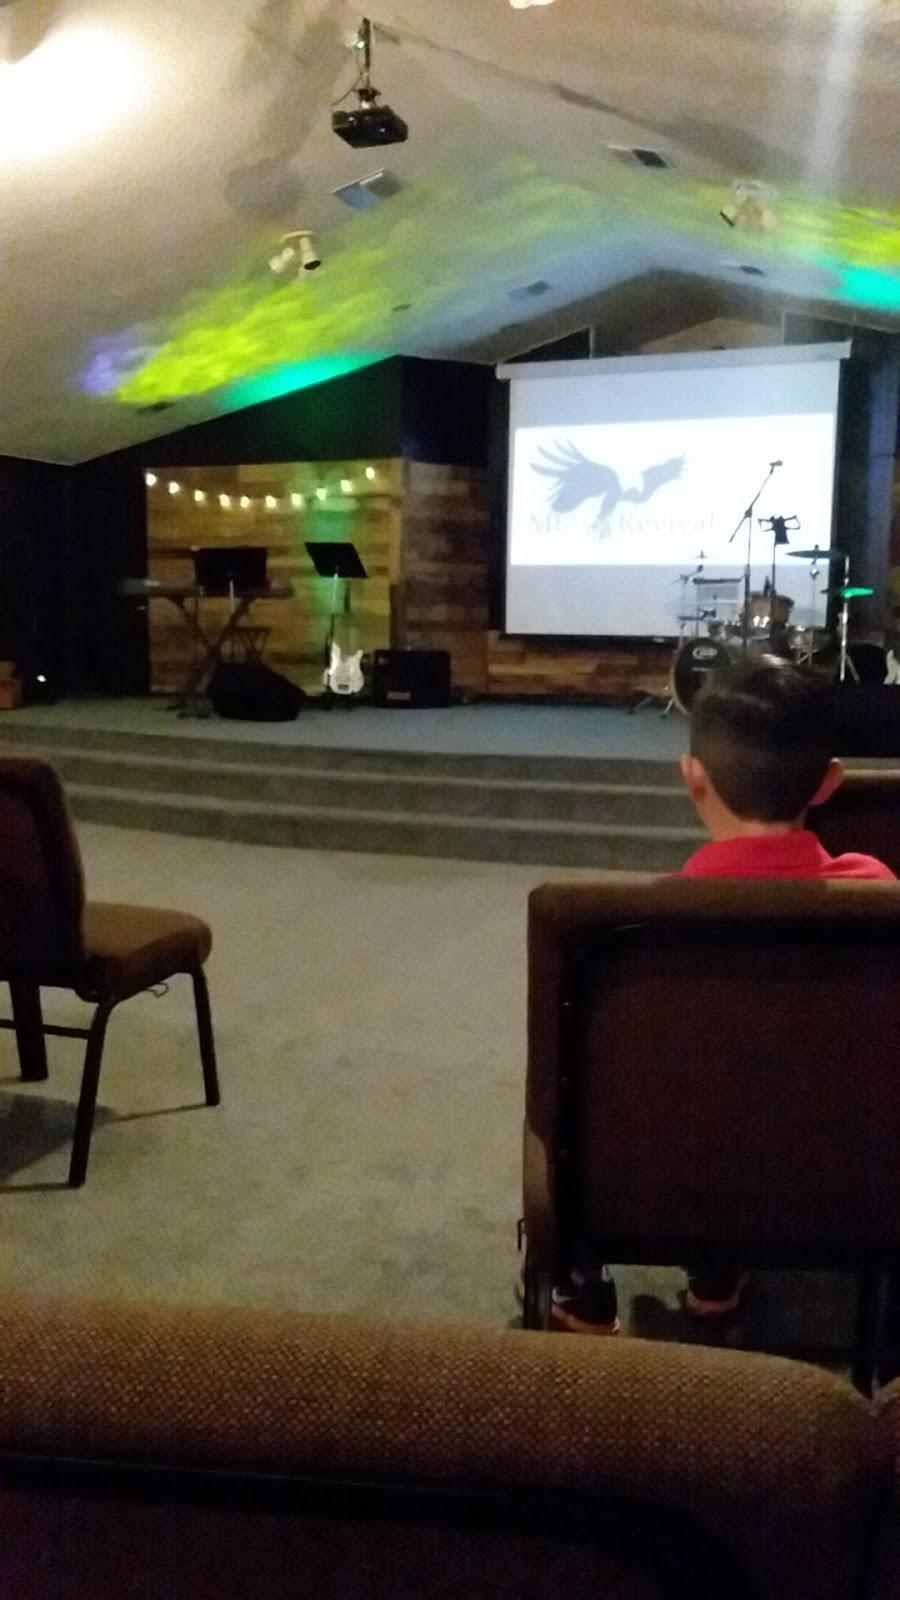 Mt. Zion Revival Center - church  | Photo 4 of 7 | Address: 2106 Jones Rd, Beeville, TX 78102, USA | Phone: (361) 343-5622